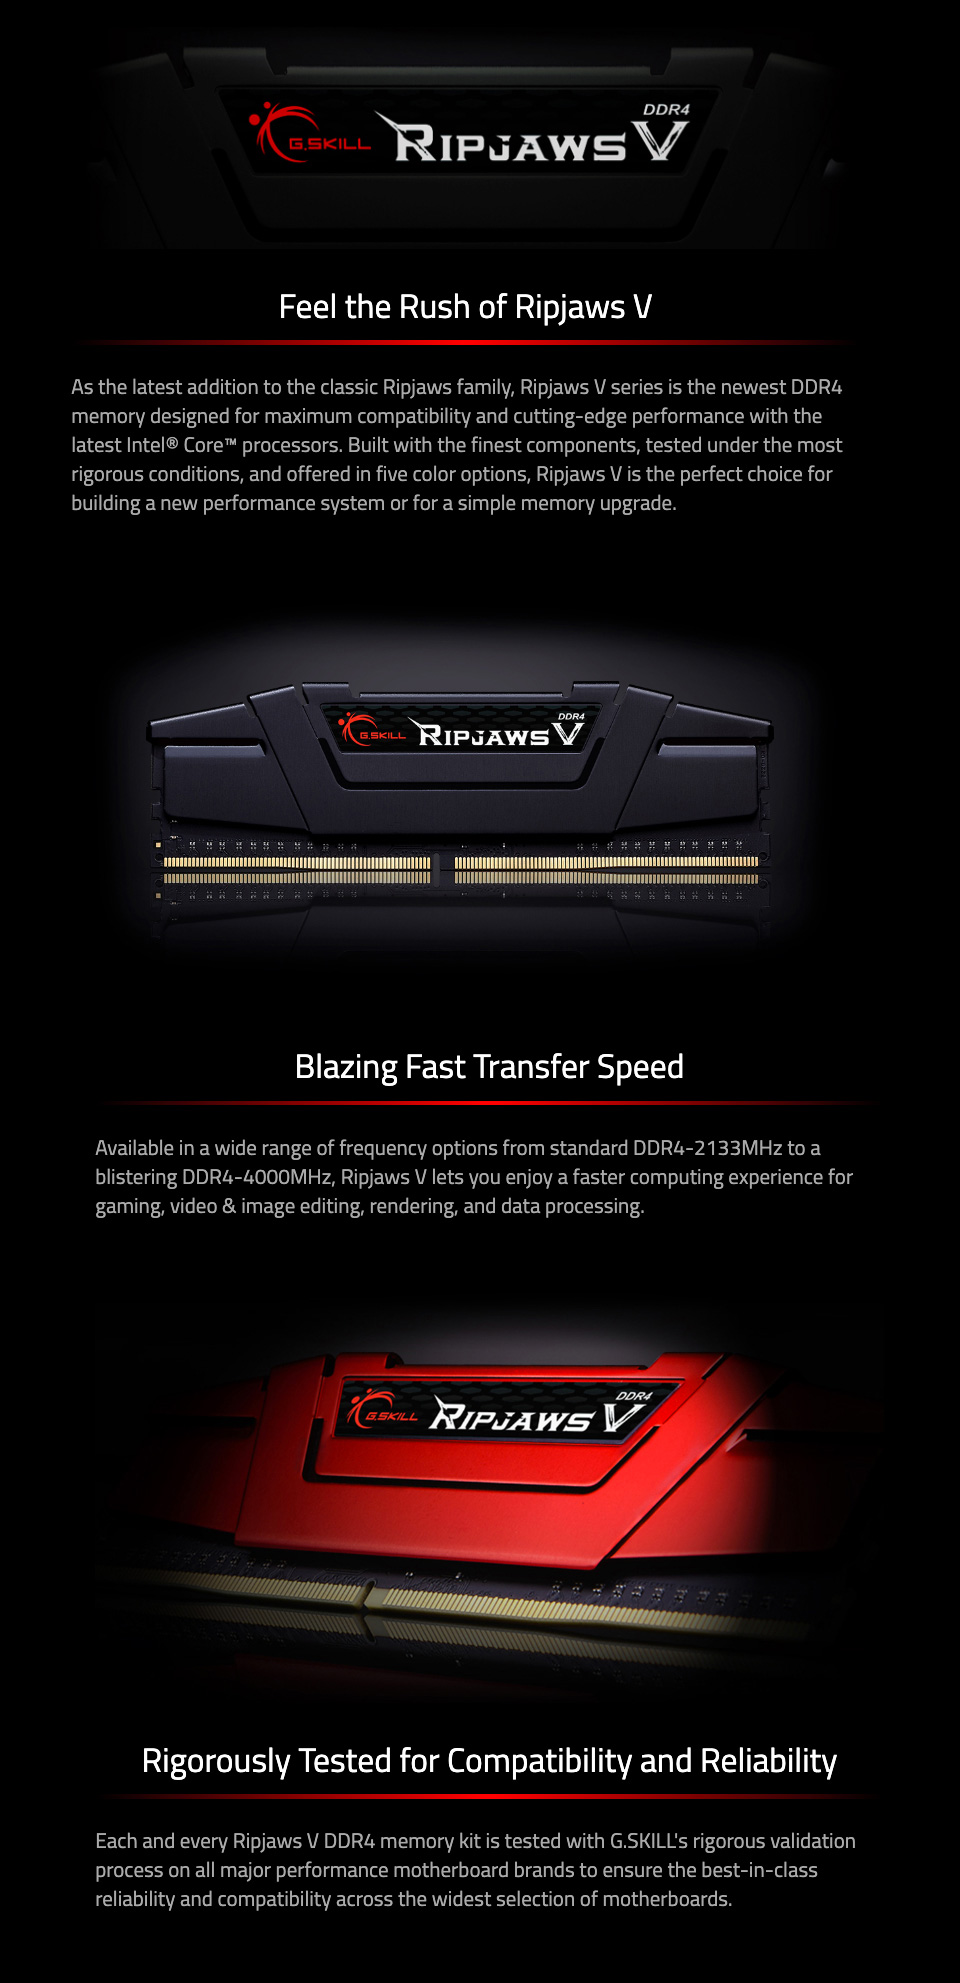 G.Skill Ripjaws V F4-4000C18D-16GVK 16GB (2x8GB) DDR4 features